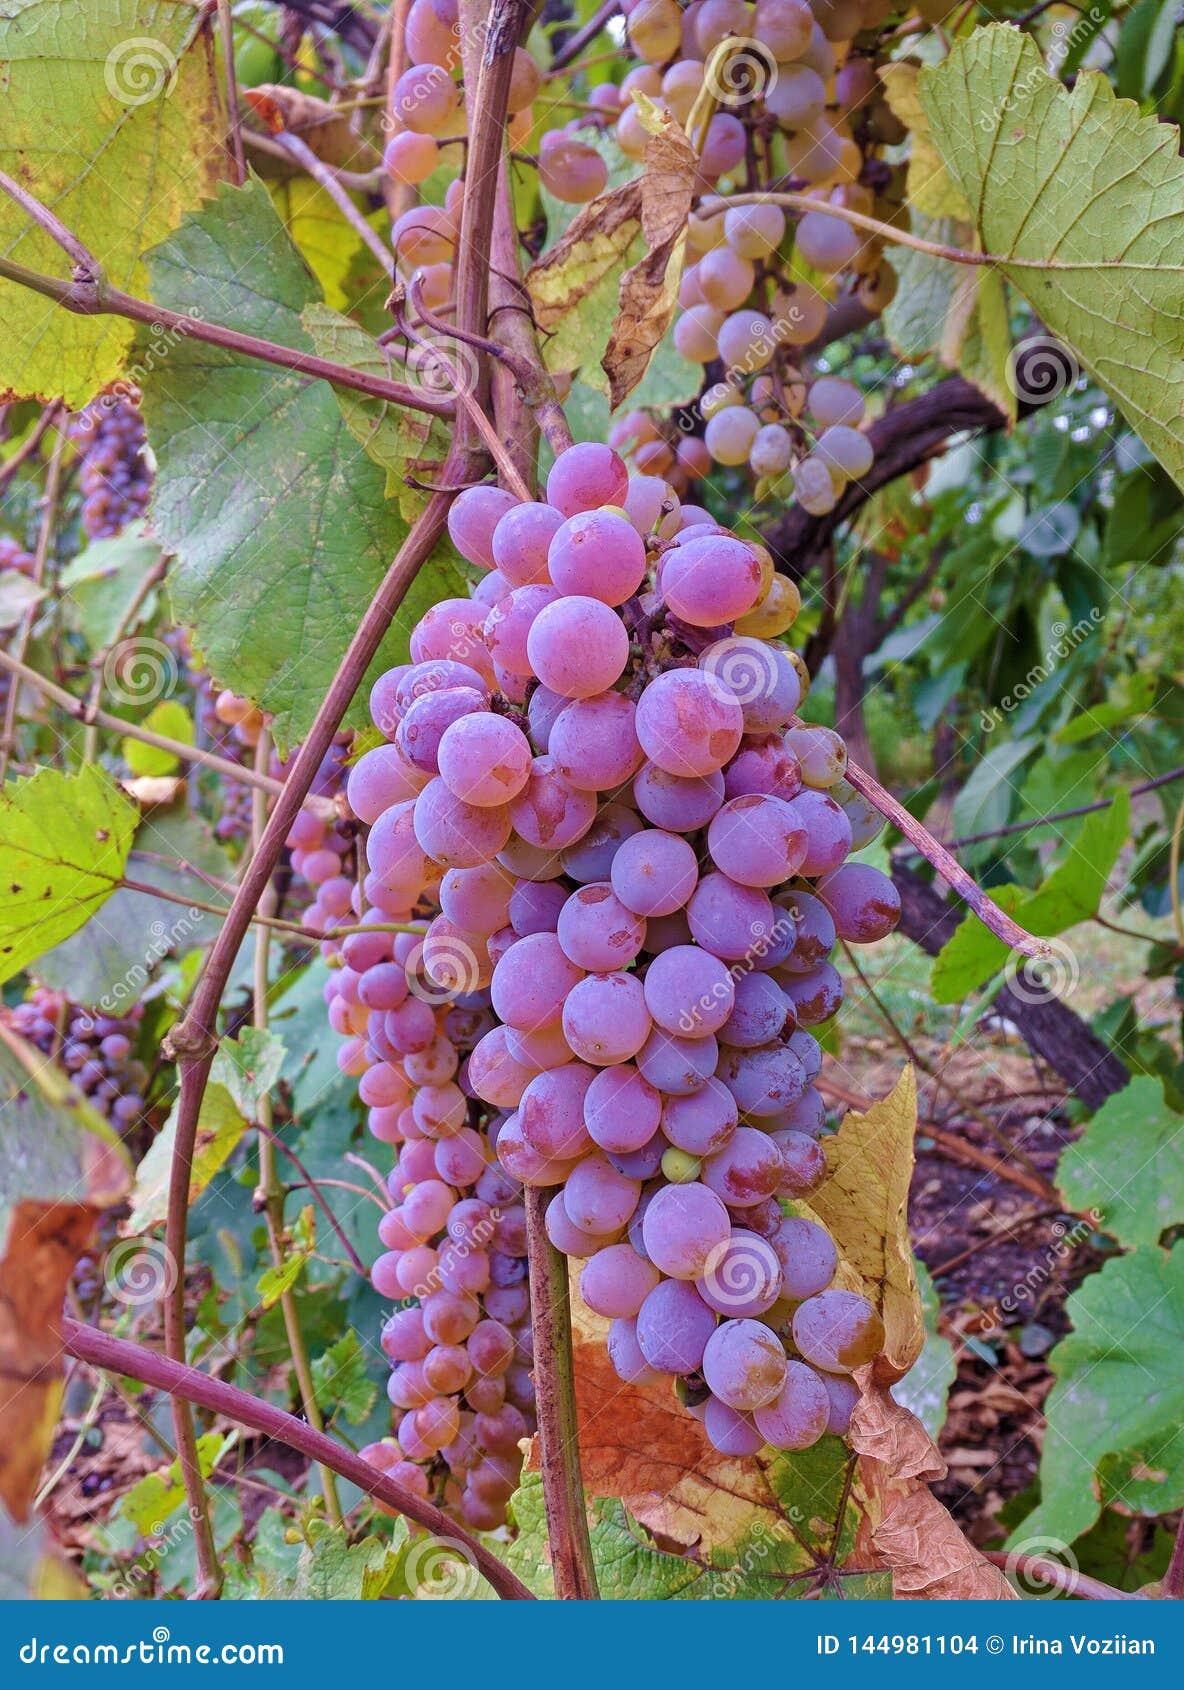 Great ripe purple grapes hanging on grape shrub